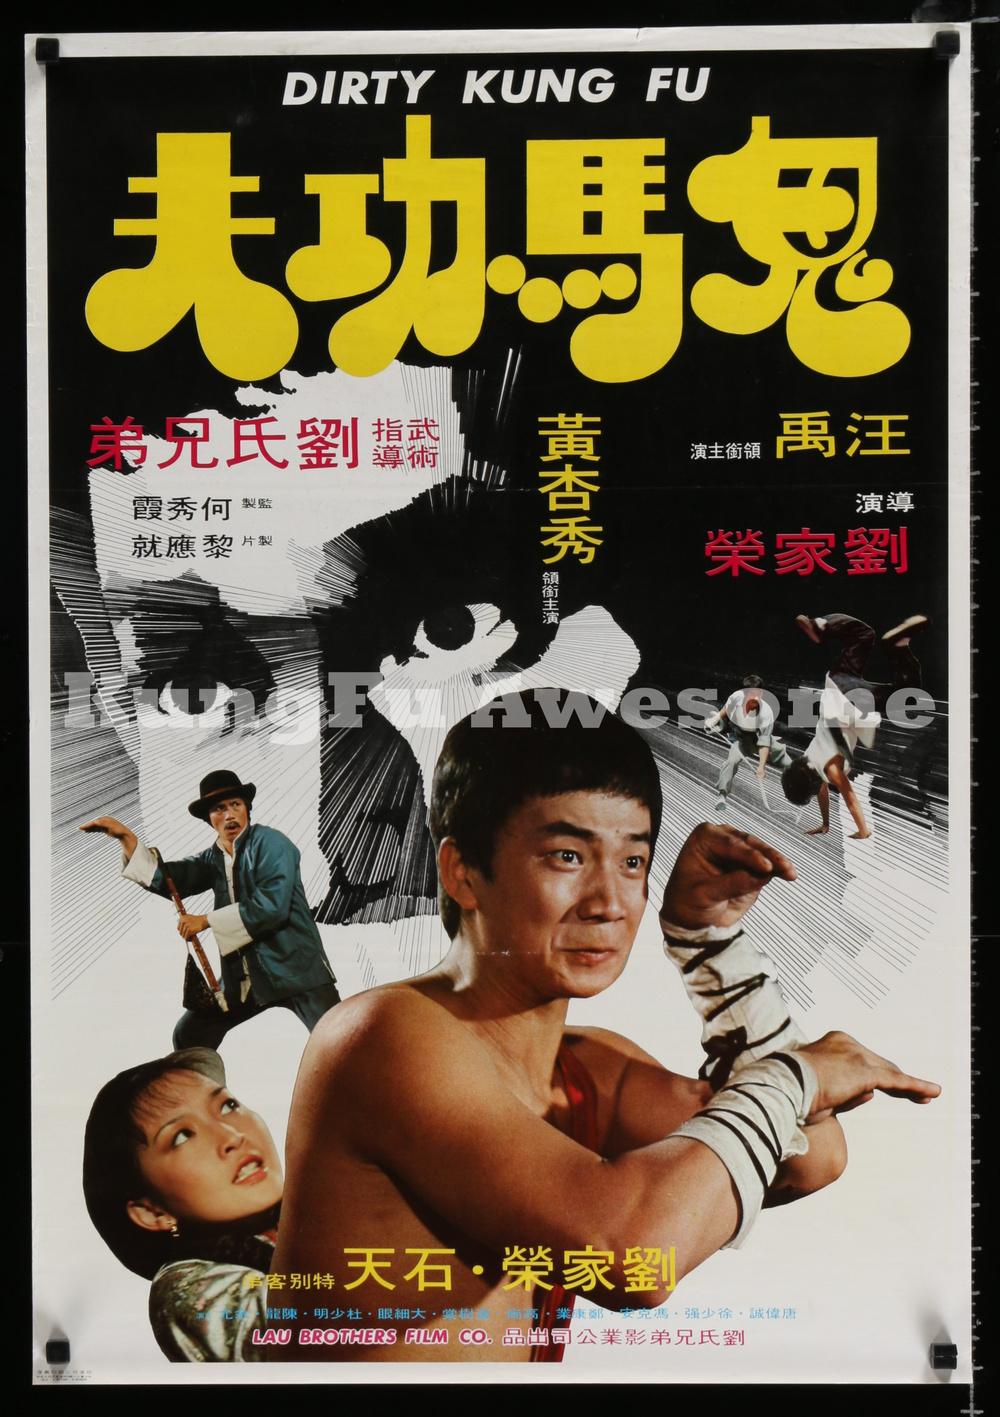 hong_kong_dirty_kung_fu_SD00422_C.jpg